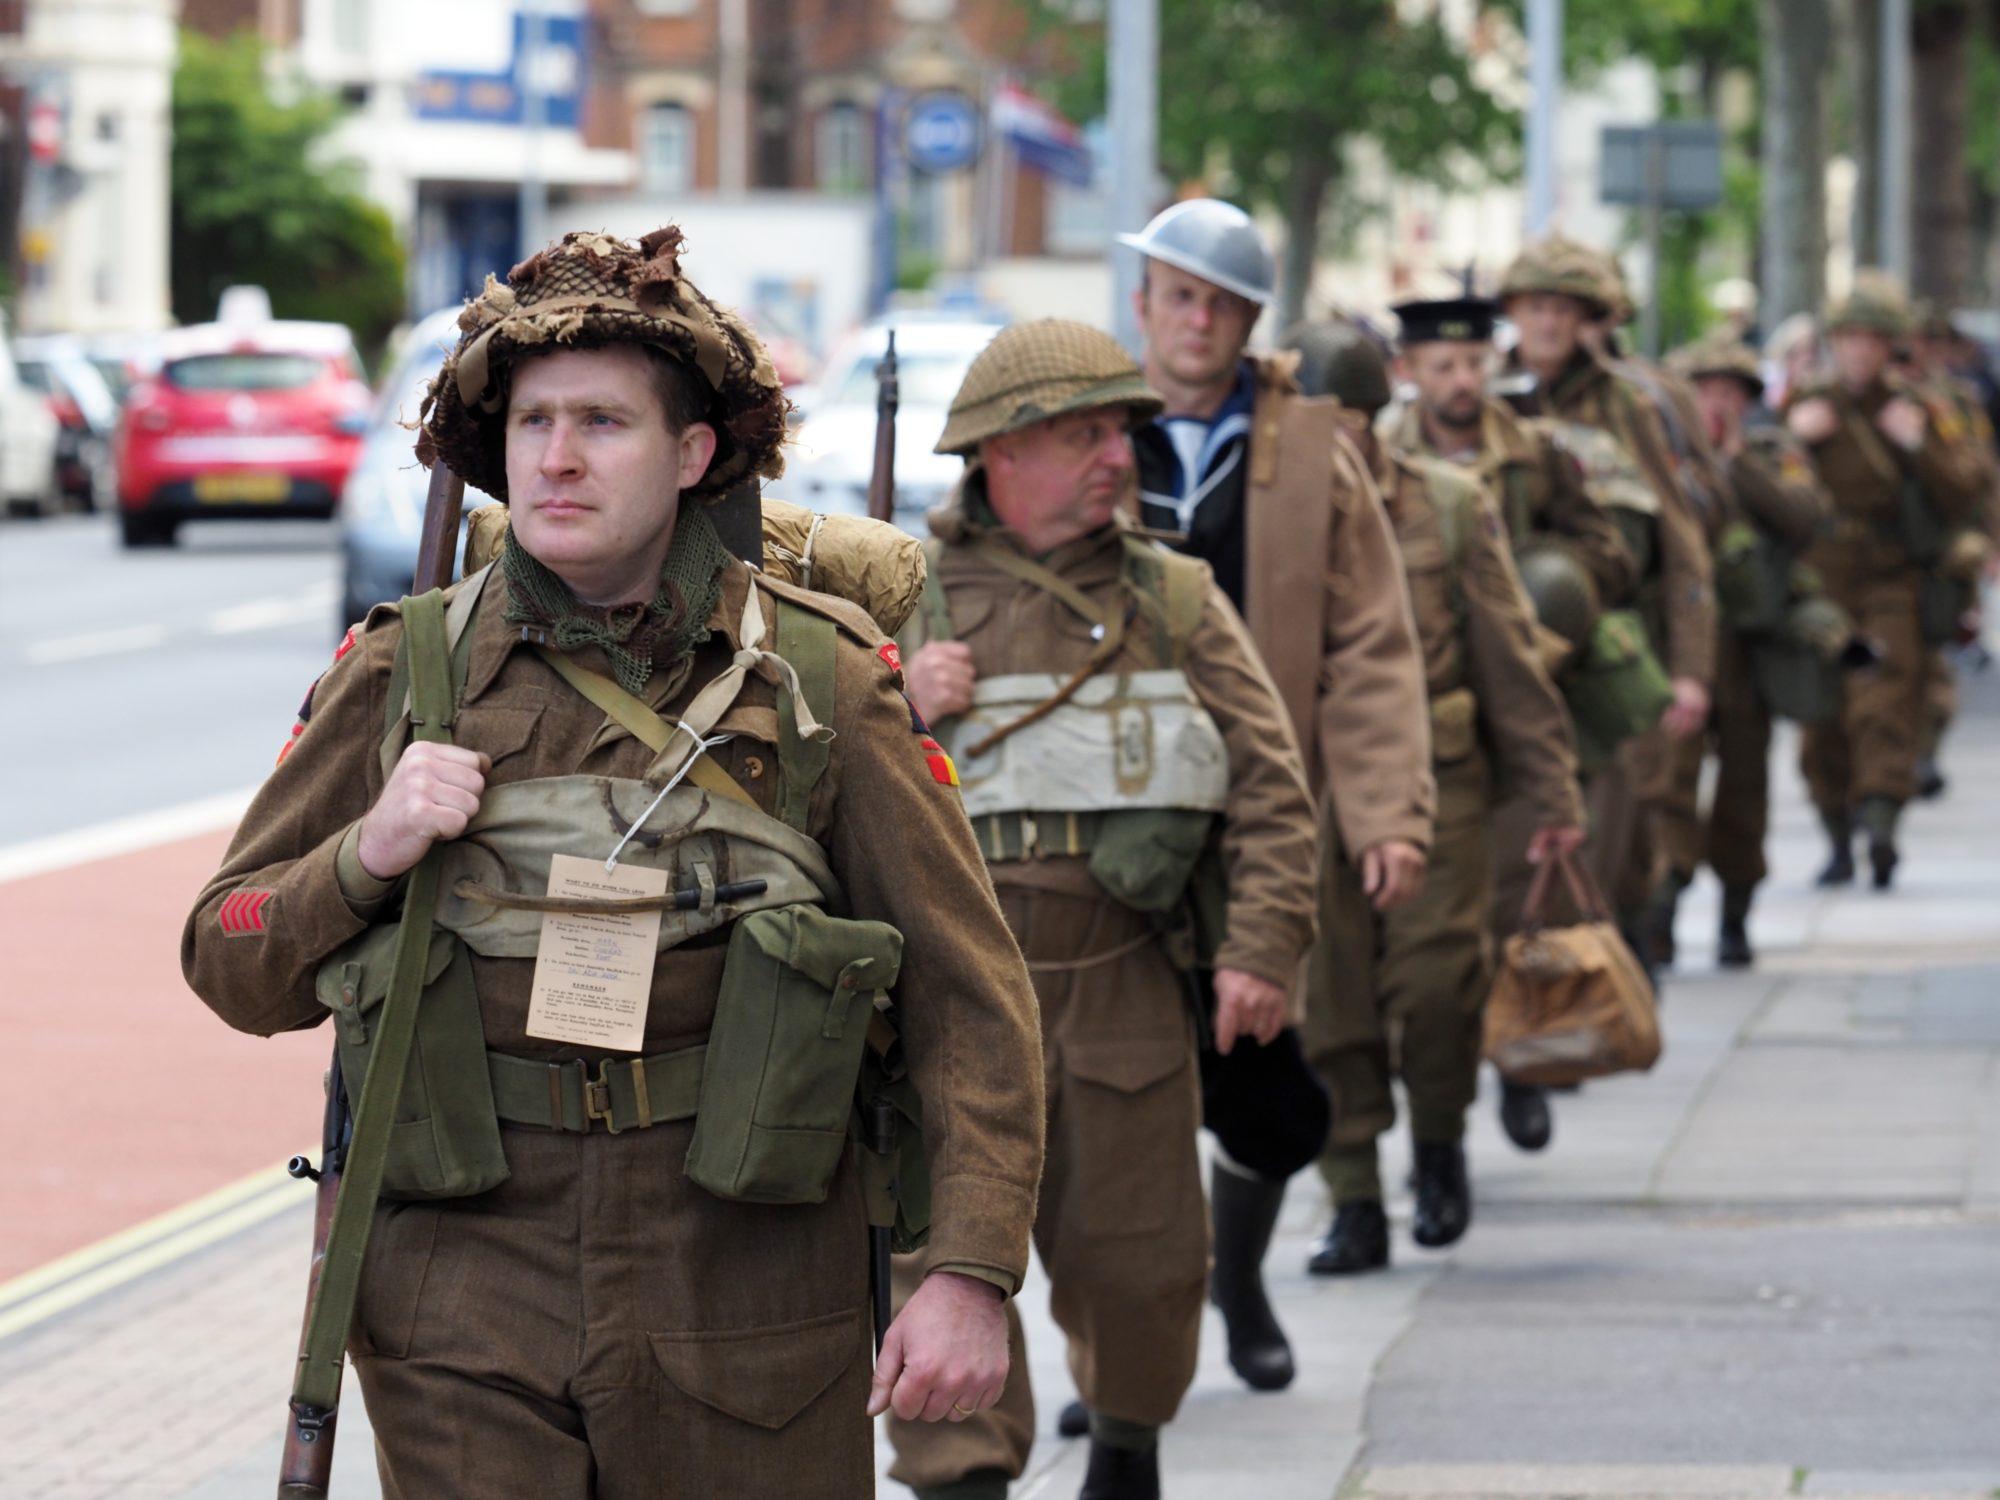 Re-enactors walking down the street for We Knew Something Was Happening